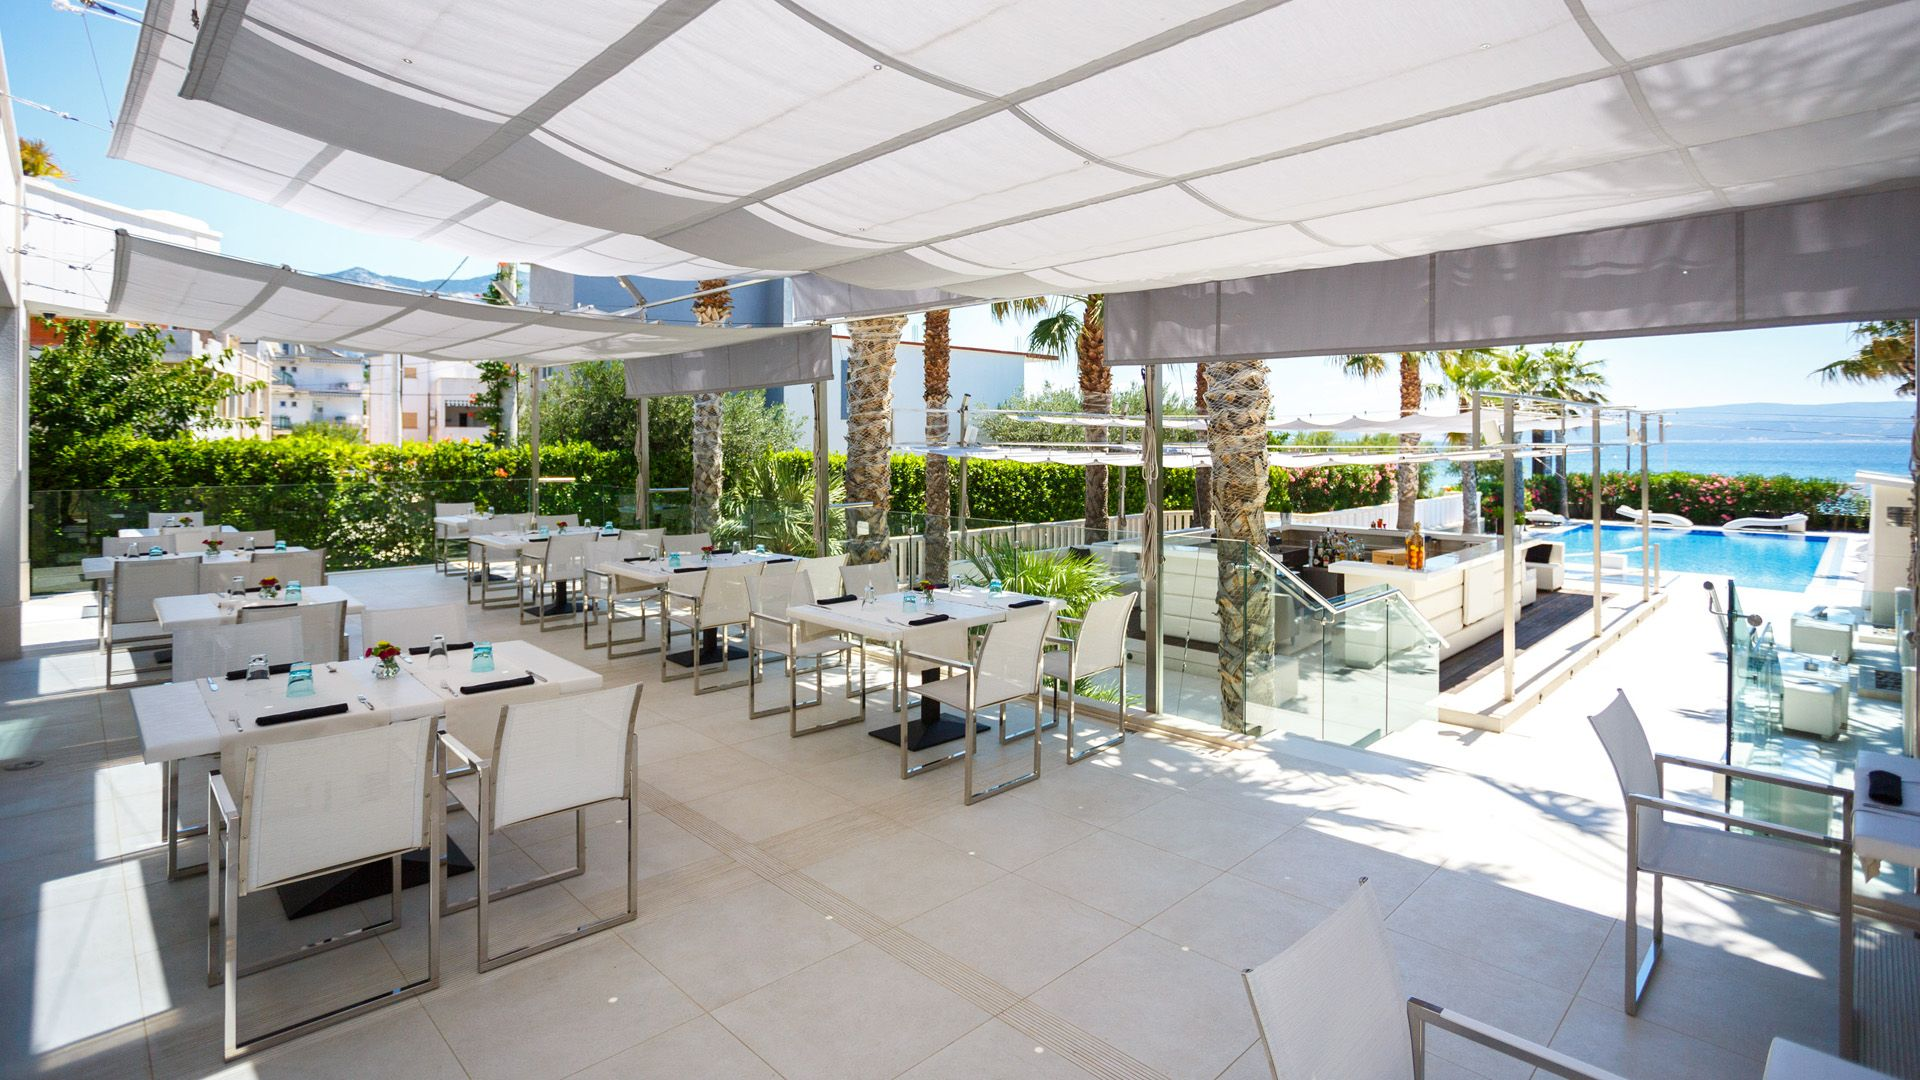 Damiiano Restaurant